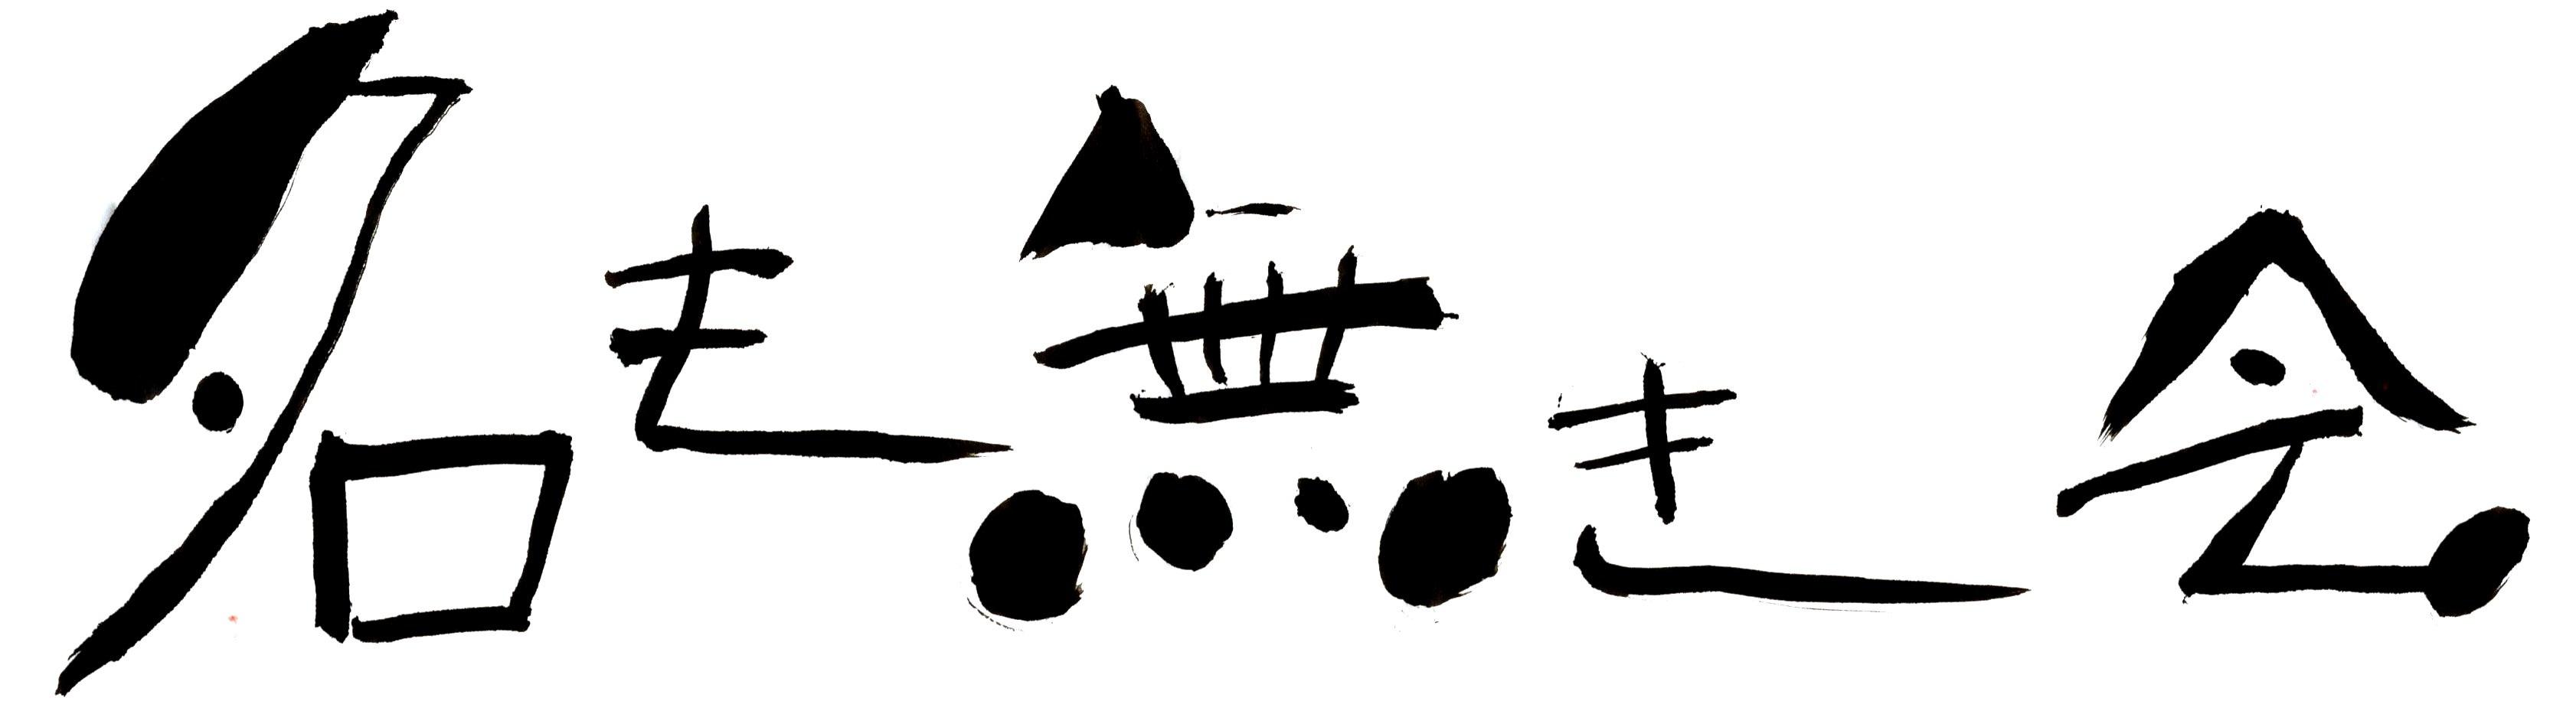 8月度 「名も無き会」 〆切_e0173738_1173339.jpg